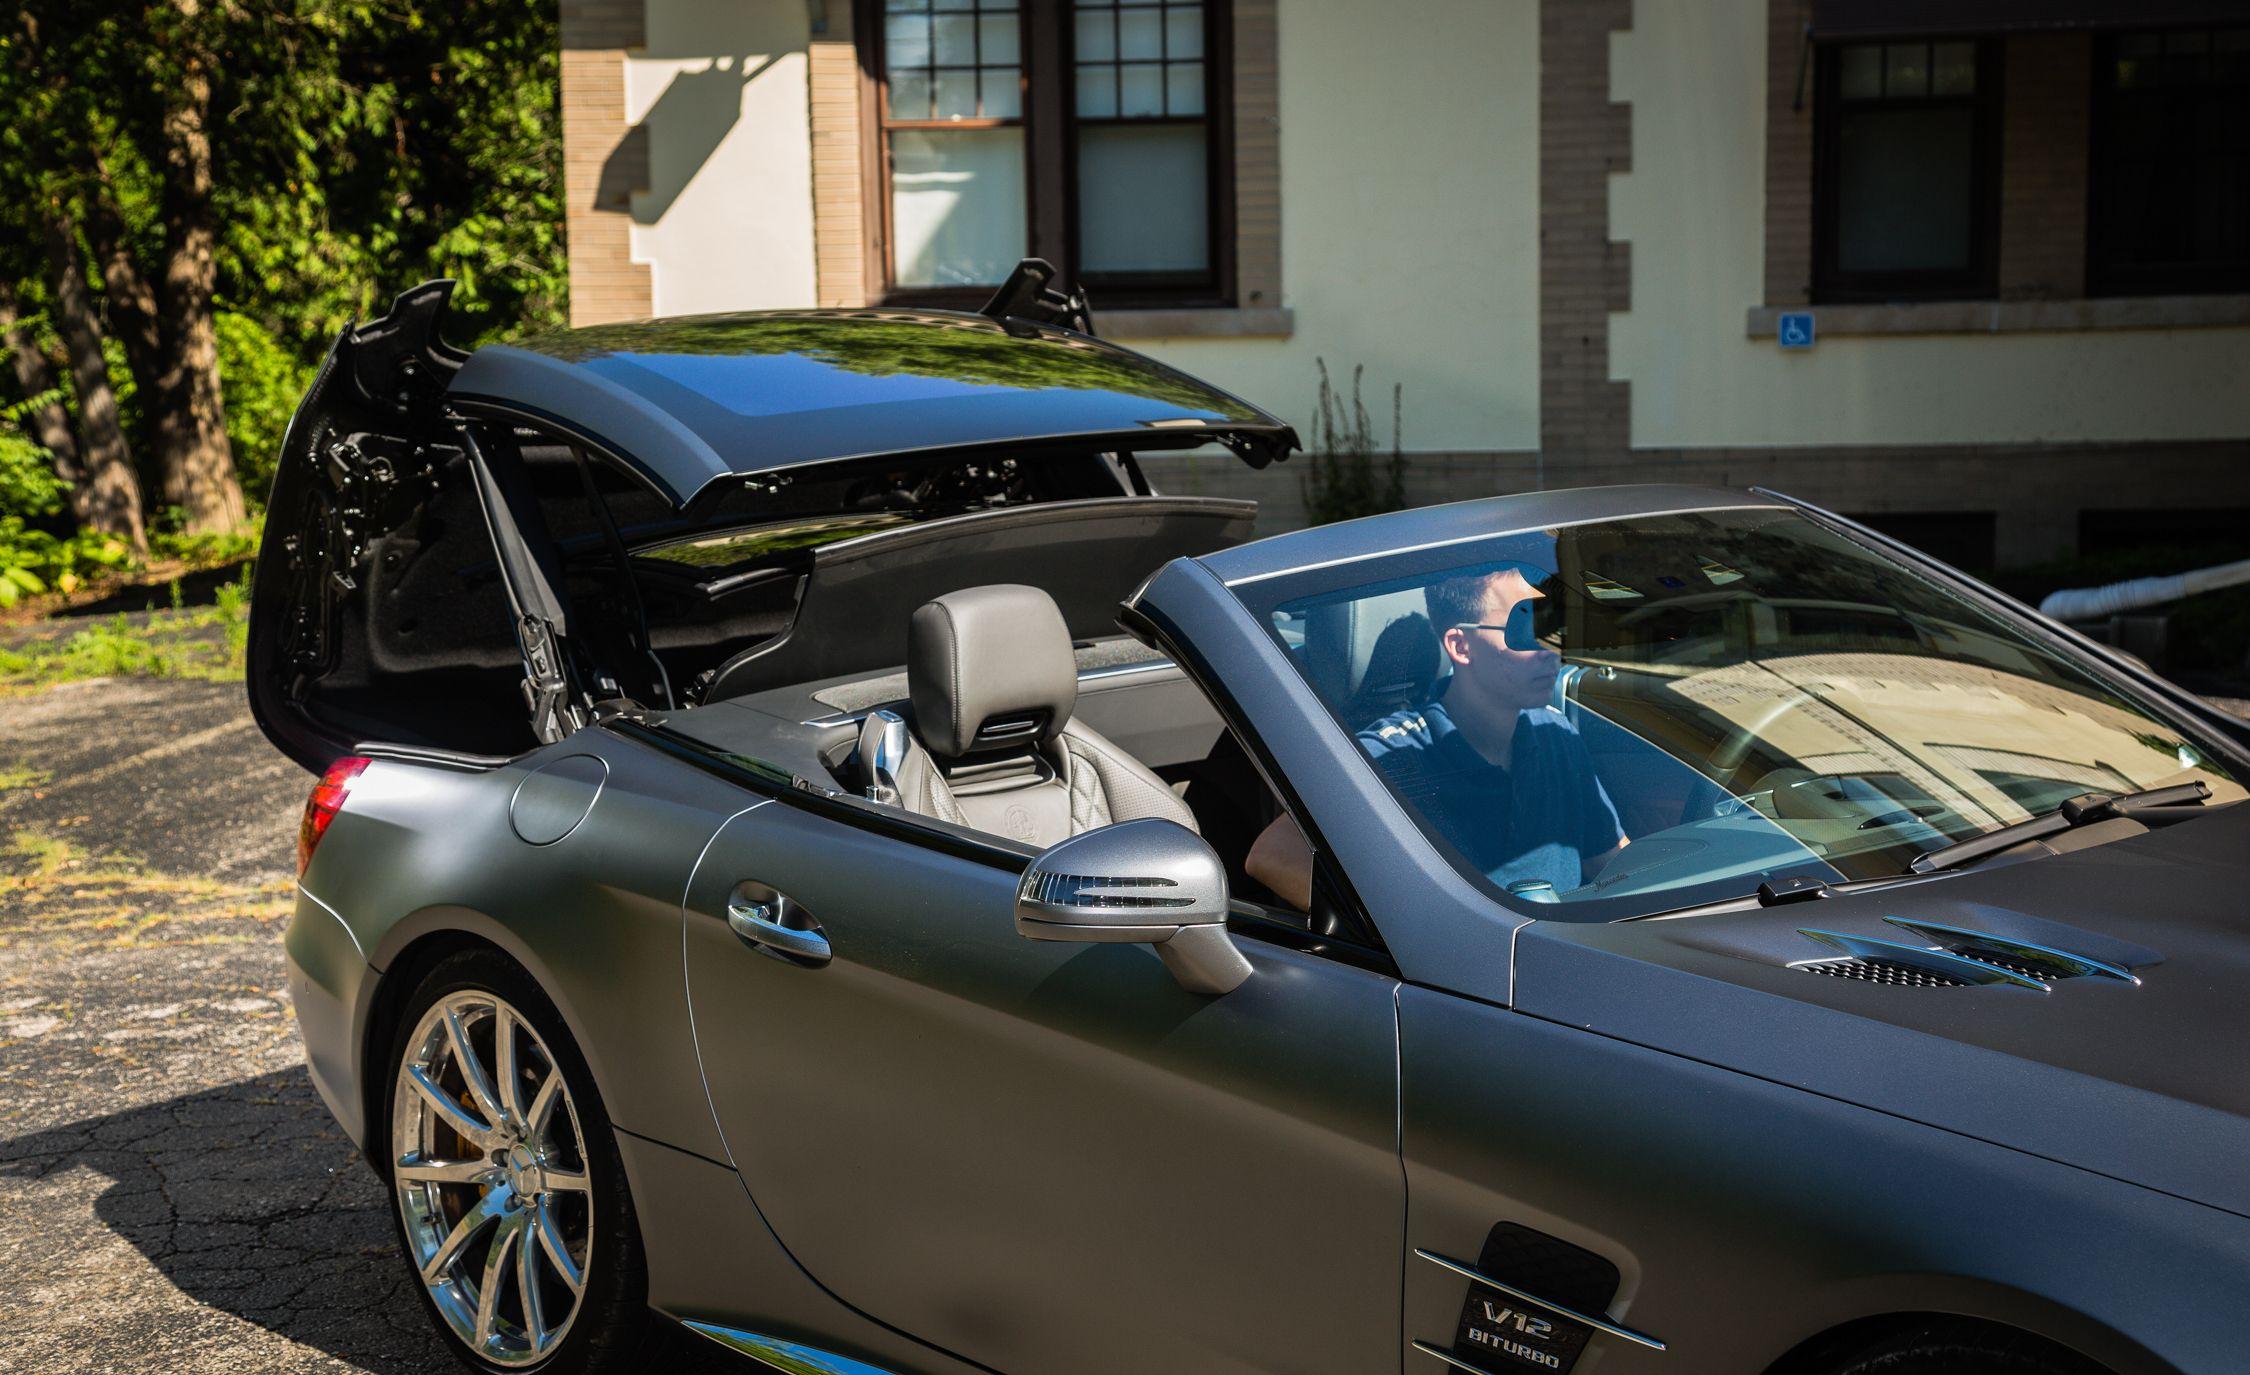 https://hips.hearstapps.com/amv-prod-cad-assets.s3.amazonaws.com/wp-content/uploads/2016/08/2017-Mercedes-AMG-SL65-123.jpg